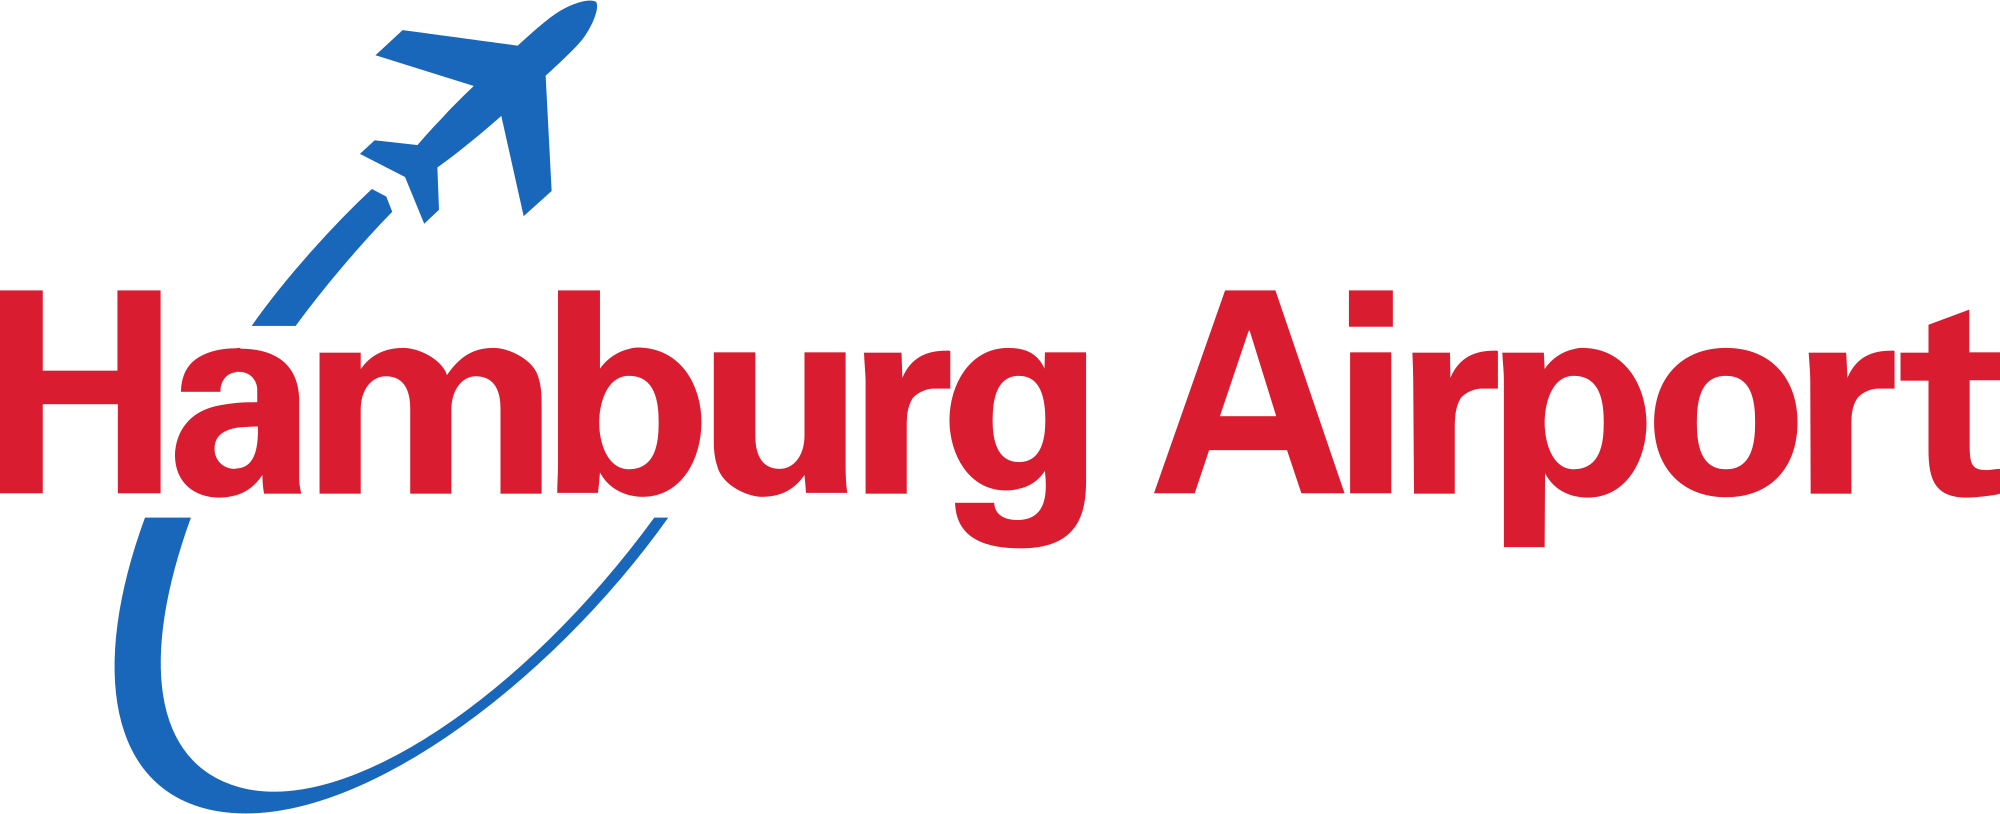 Hamburg Airport parkensensoren